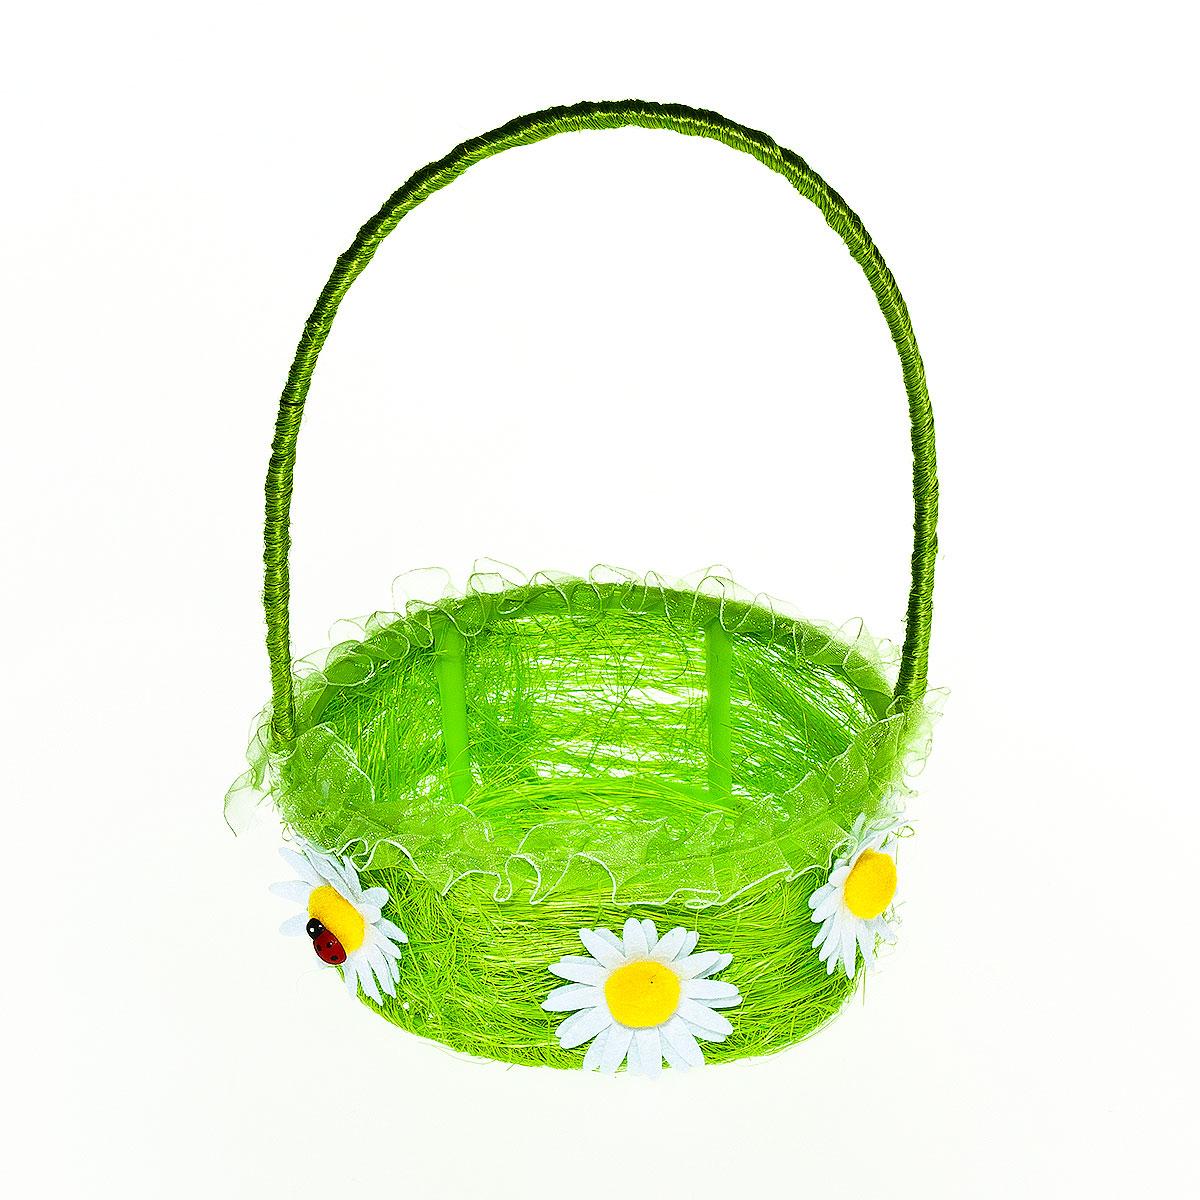 Корзина декоративная Home Queen Цветы, цвет: зеленый, 15,5 х 14,5 х 6,5 см корзина декоративная home queen ромашки цвет желтый 16 х 16 х 8 см